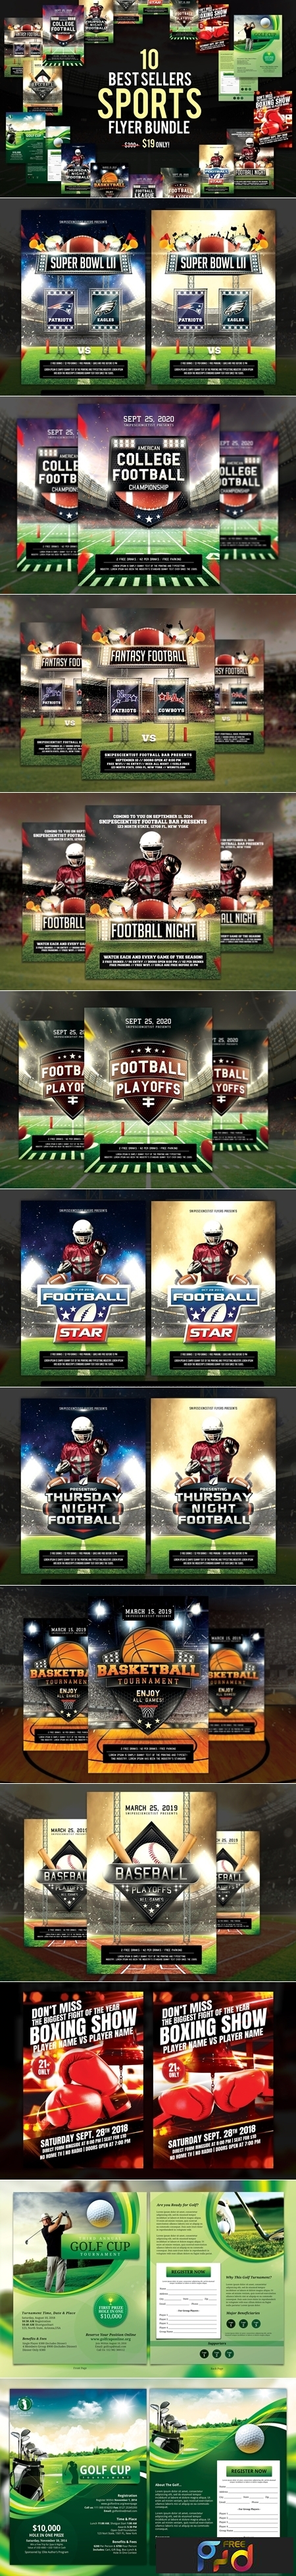 10 Best Sellers Sports Flyer Bundle 3152664 1